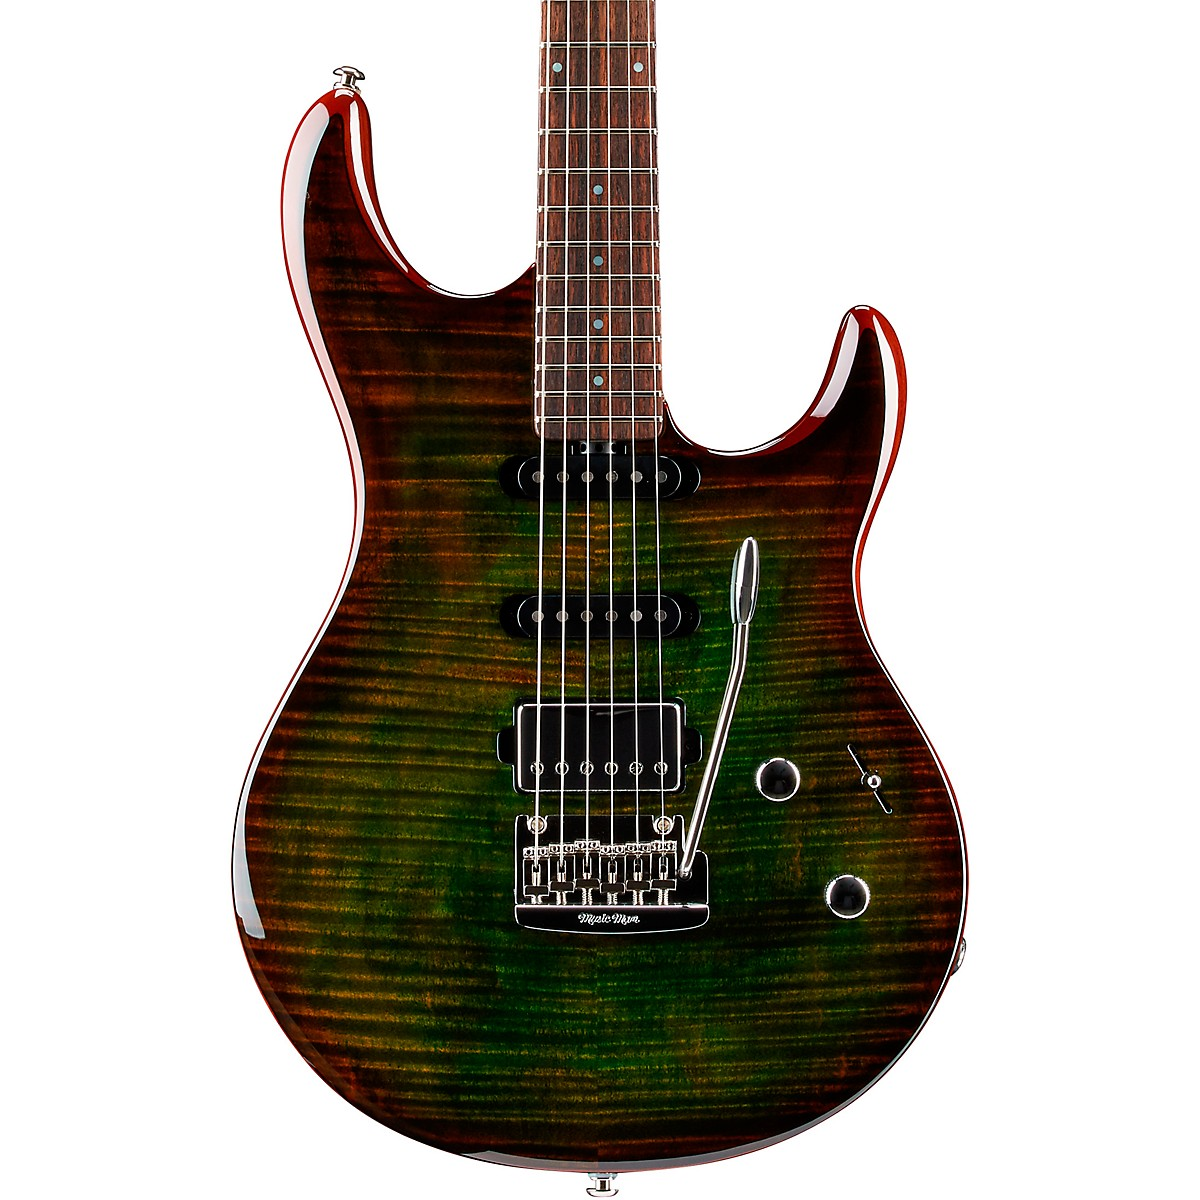 Ernie Ball Music Man Luke 3 HSS Flame Maple Top Rosewood Fingerboard Electric Guitar